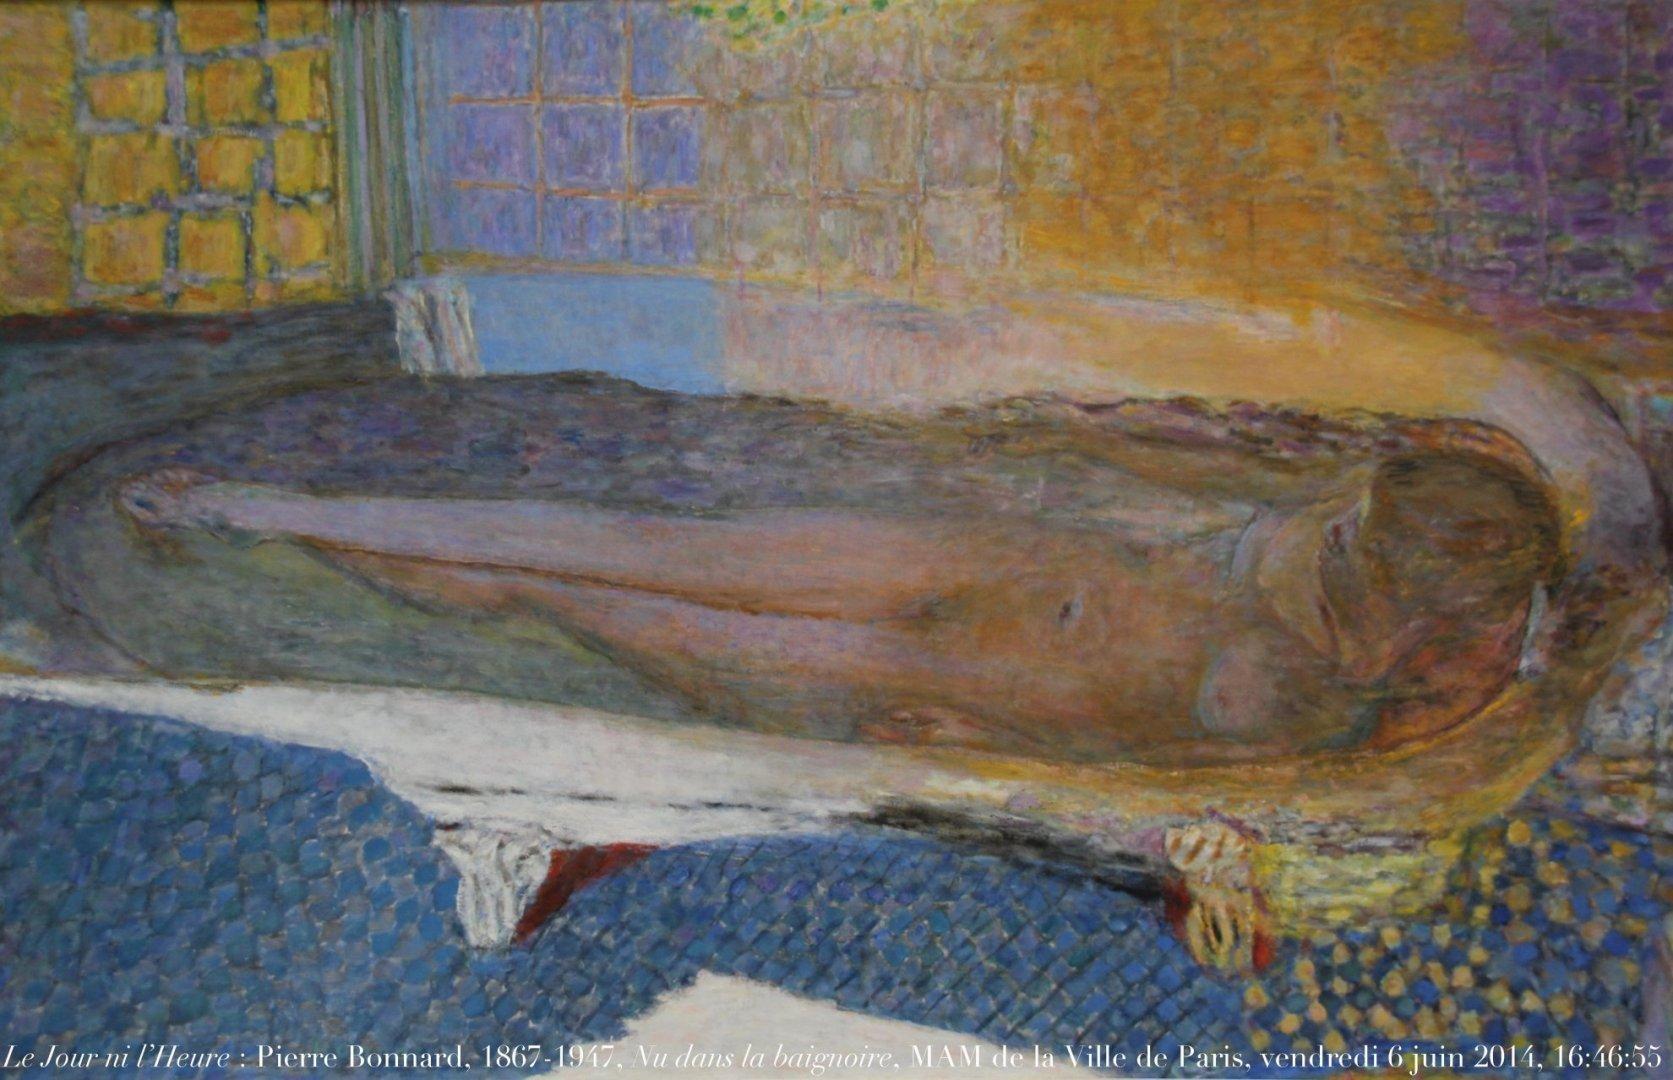 10 must see artworks at the paris museum of modern art